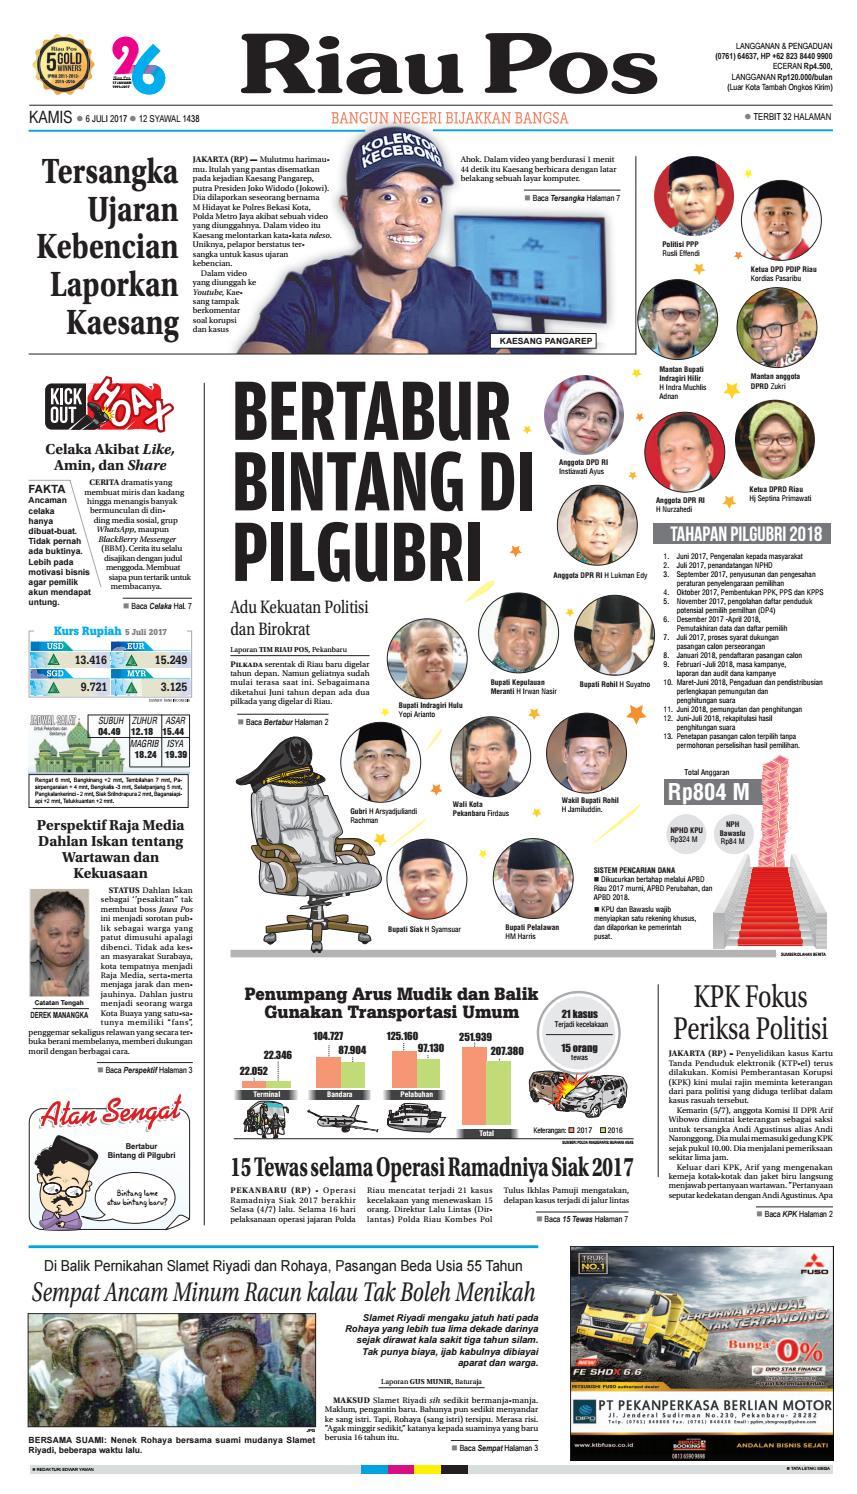 2017 07 06 By Riau Pos Issuu Tcash Vaganza 17 Samsung Adaptor Fast Charging Kualitas Original Putih